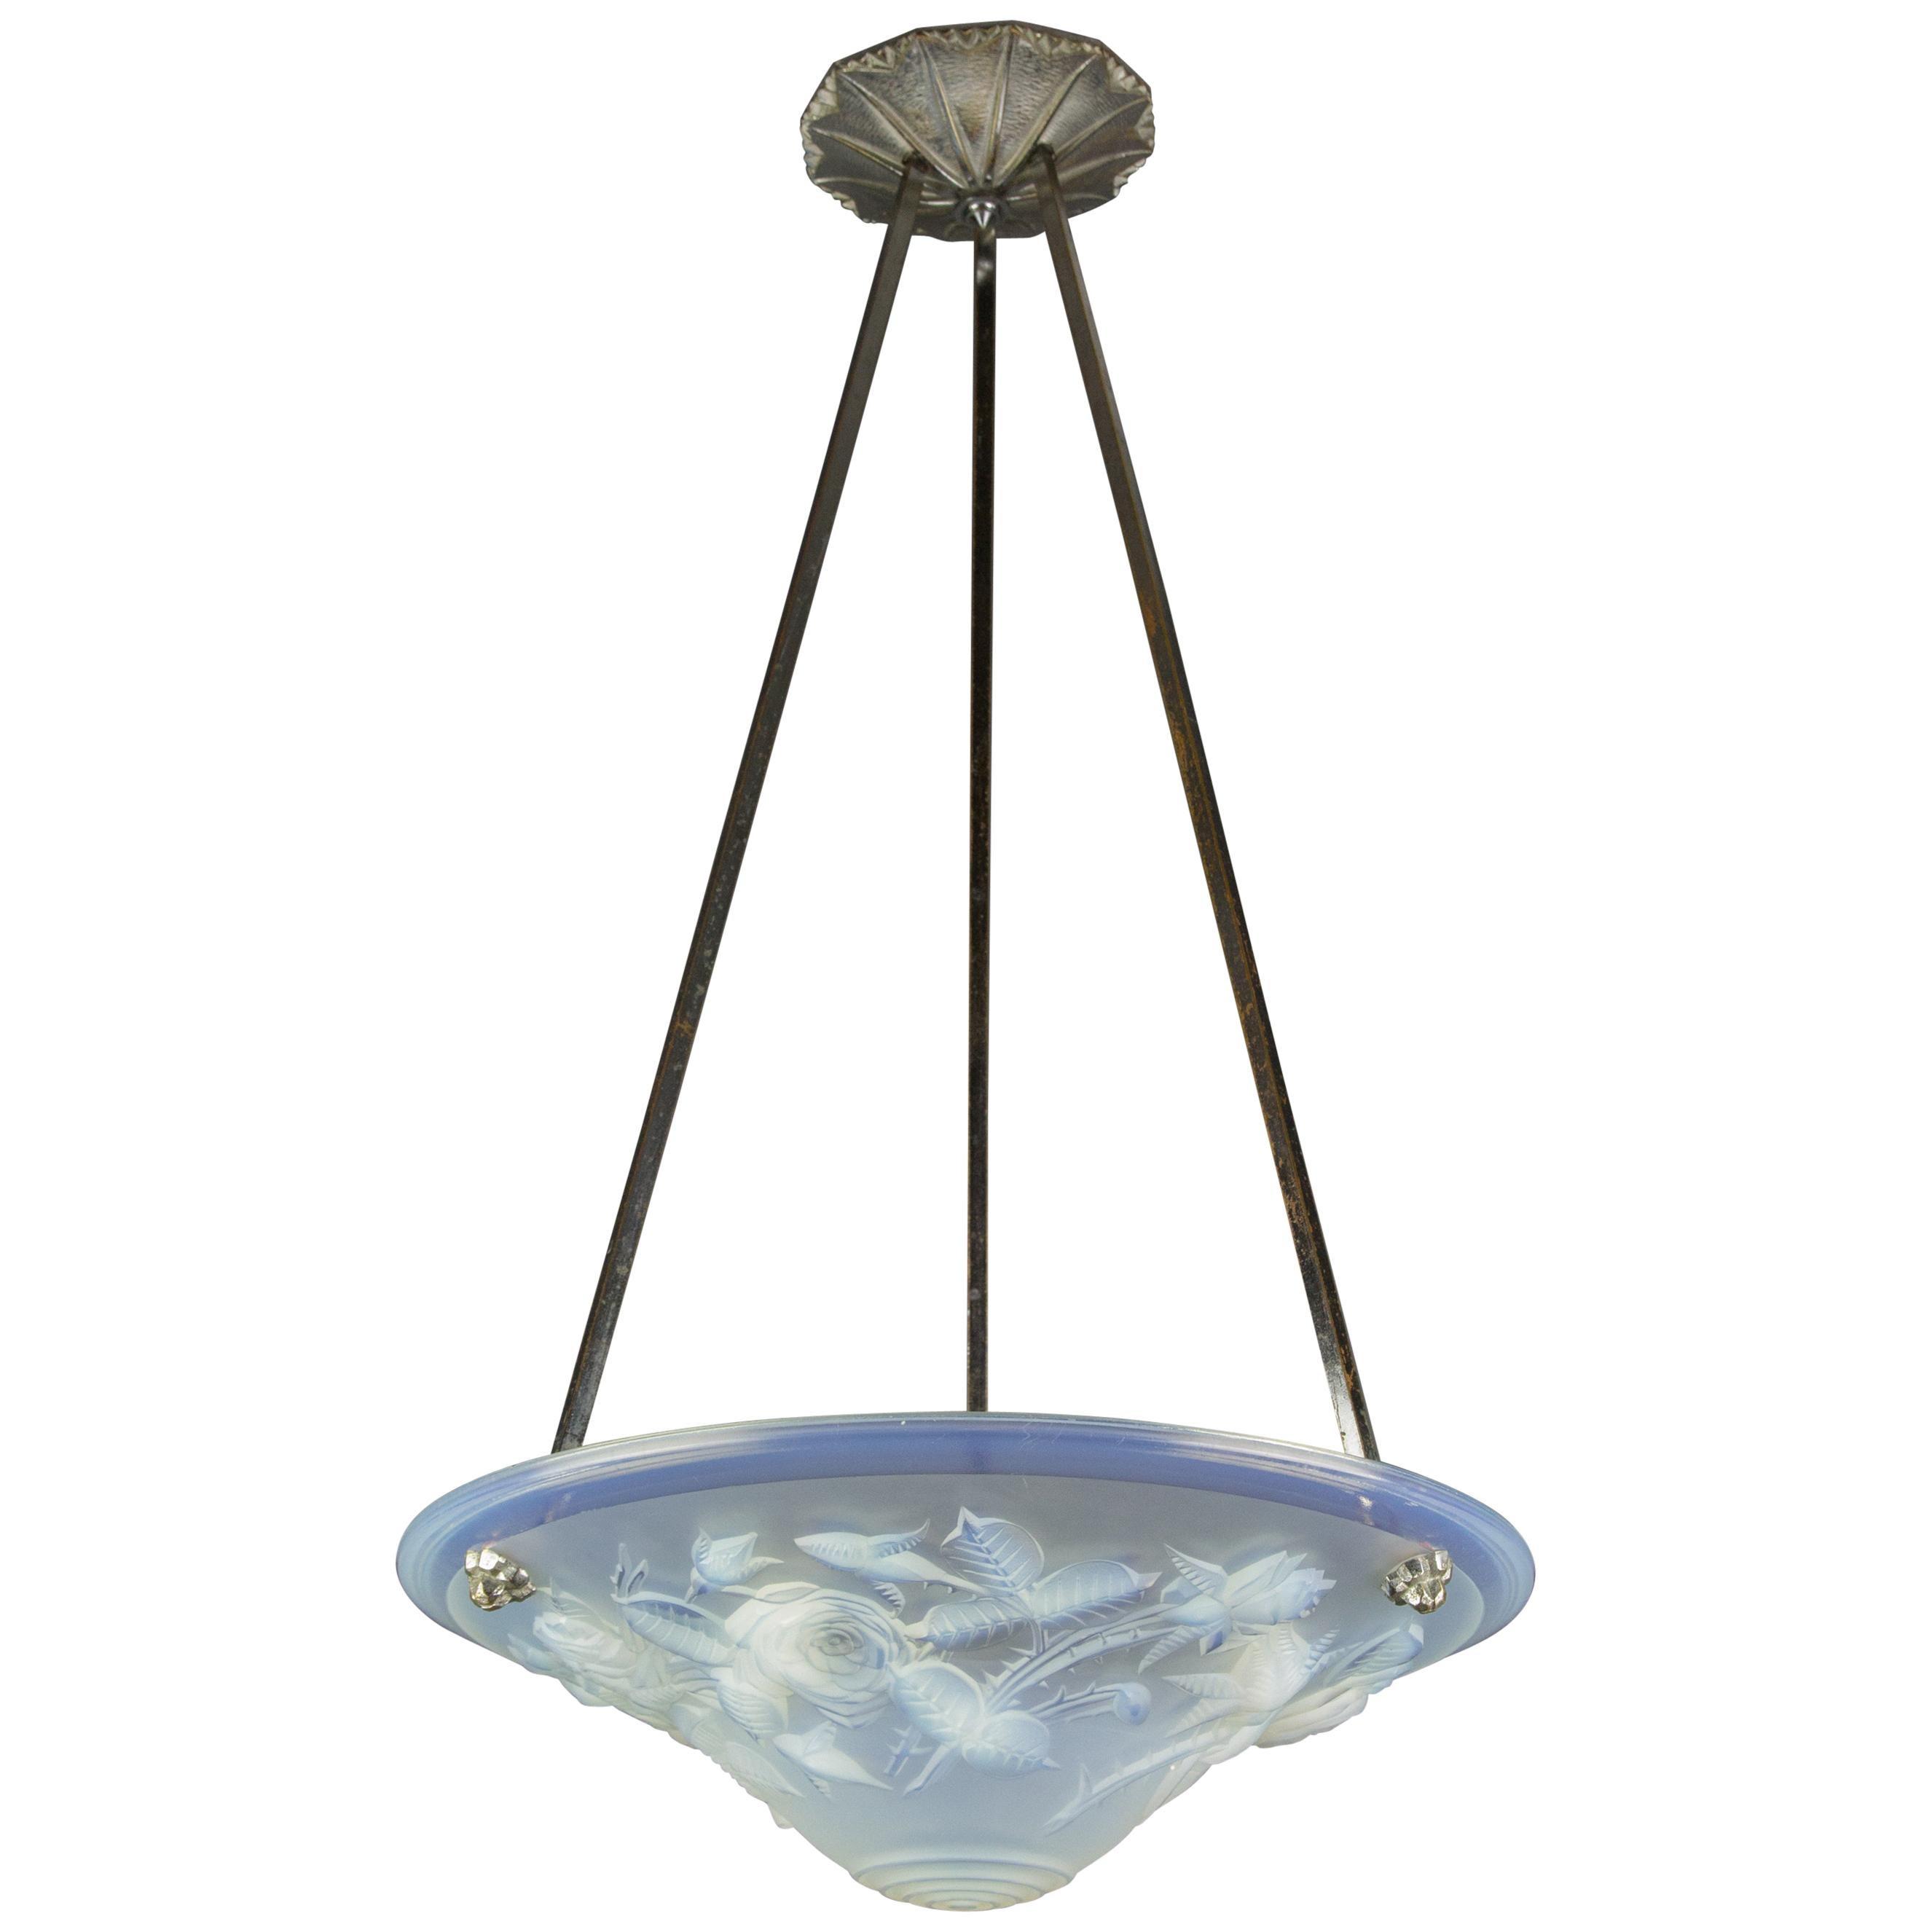 French Art Deco Opalescent Glass Chandelier Pendant by Pierre Maynadier, 1920s